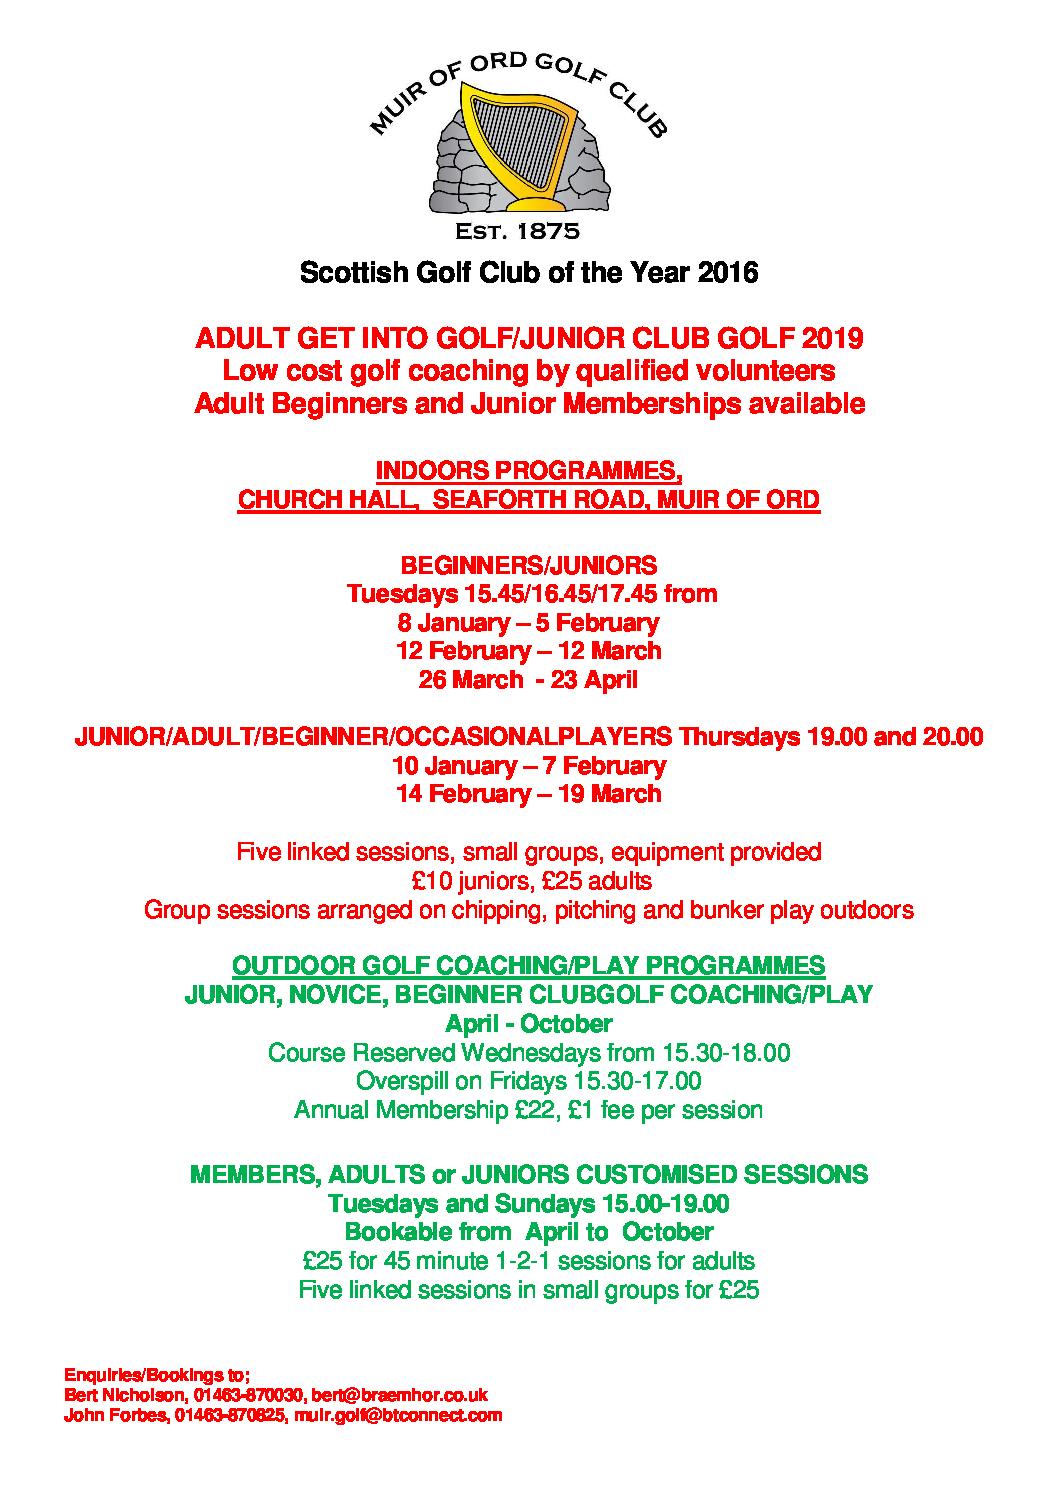 Muir of Ord Golf Club Winter 2018/2019 Coaching Information